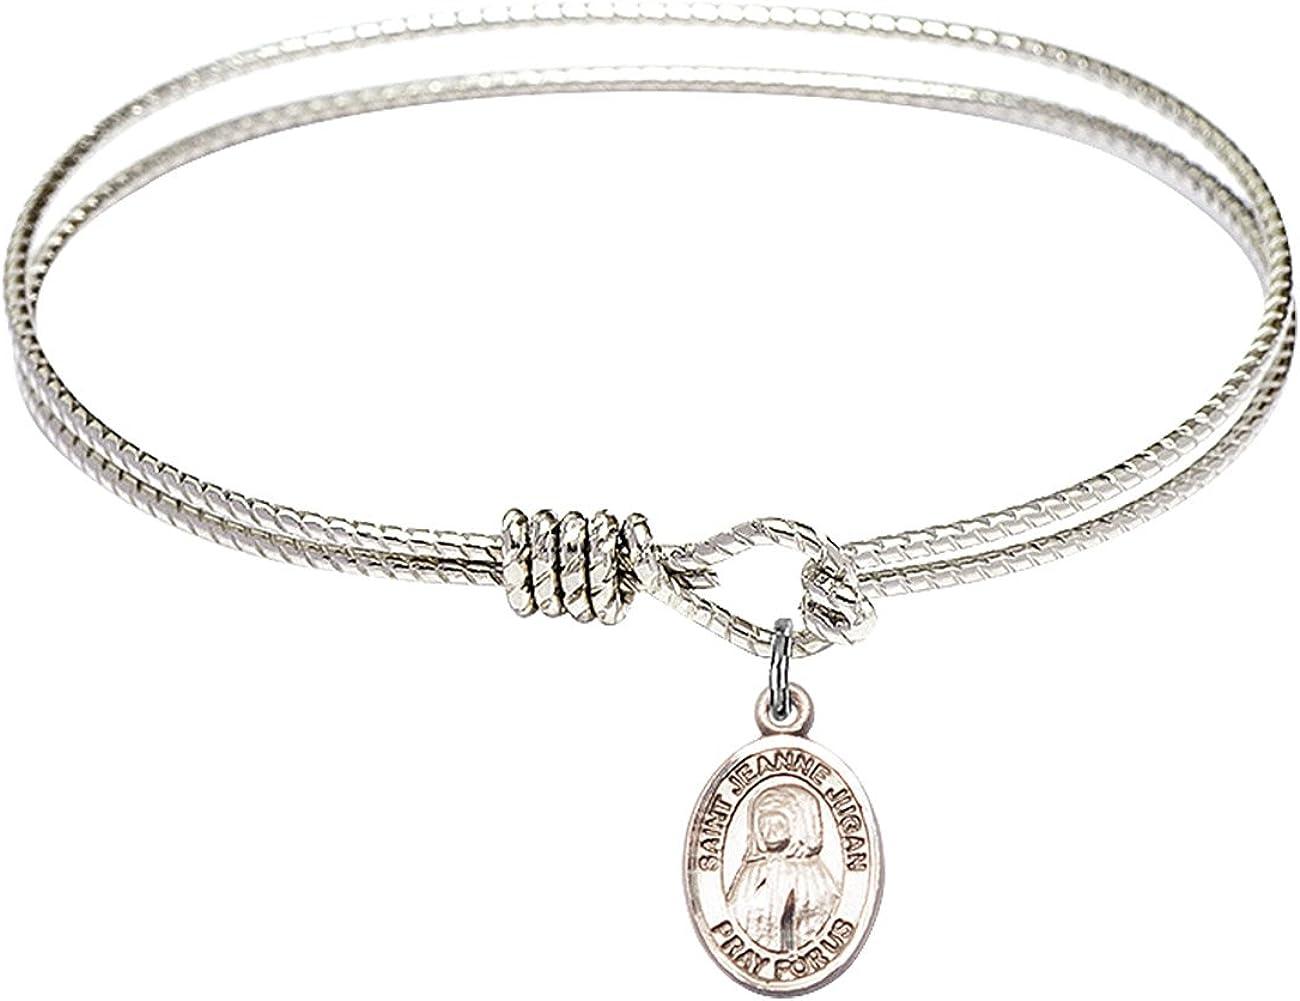 Bonyak Jewelry Oval Eye Hook Bangle Jeanne St. At the Soldering price w Jugan Bracelet